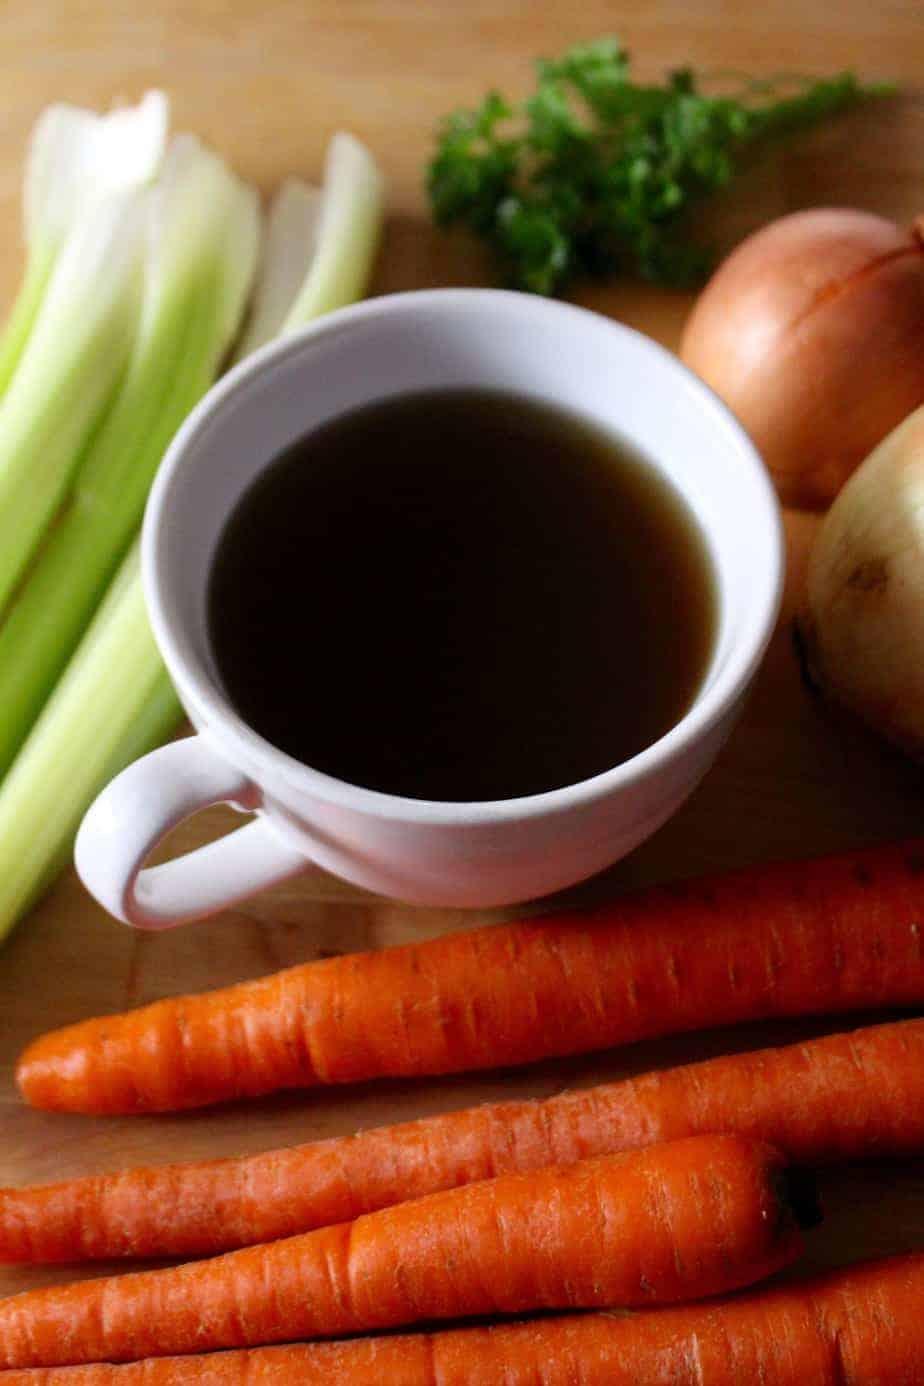 Homemade Nourishing Vegetable Broth | Frugal Nutrition